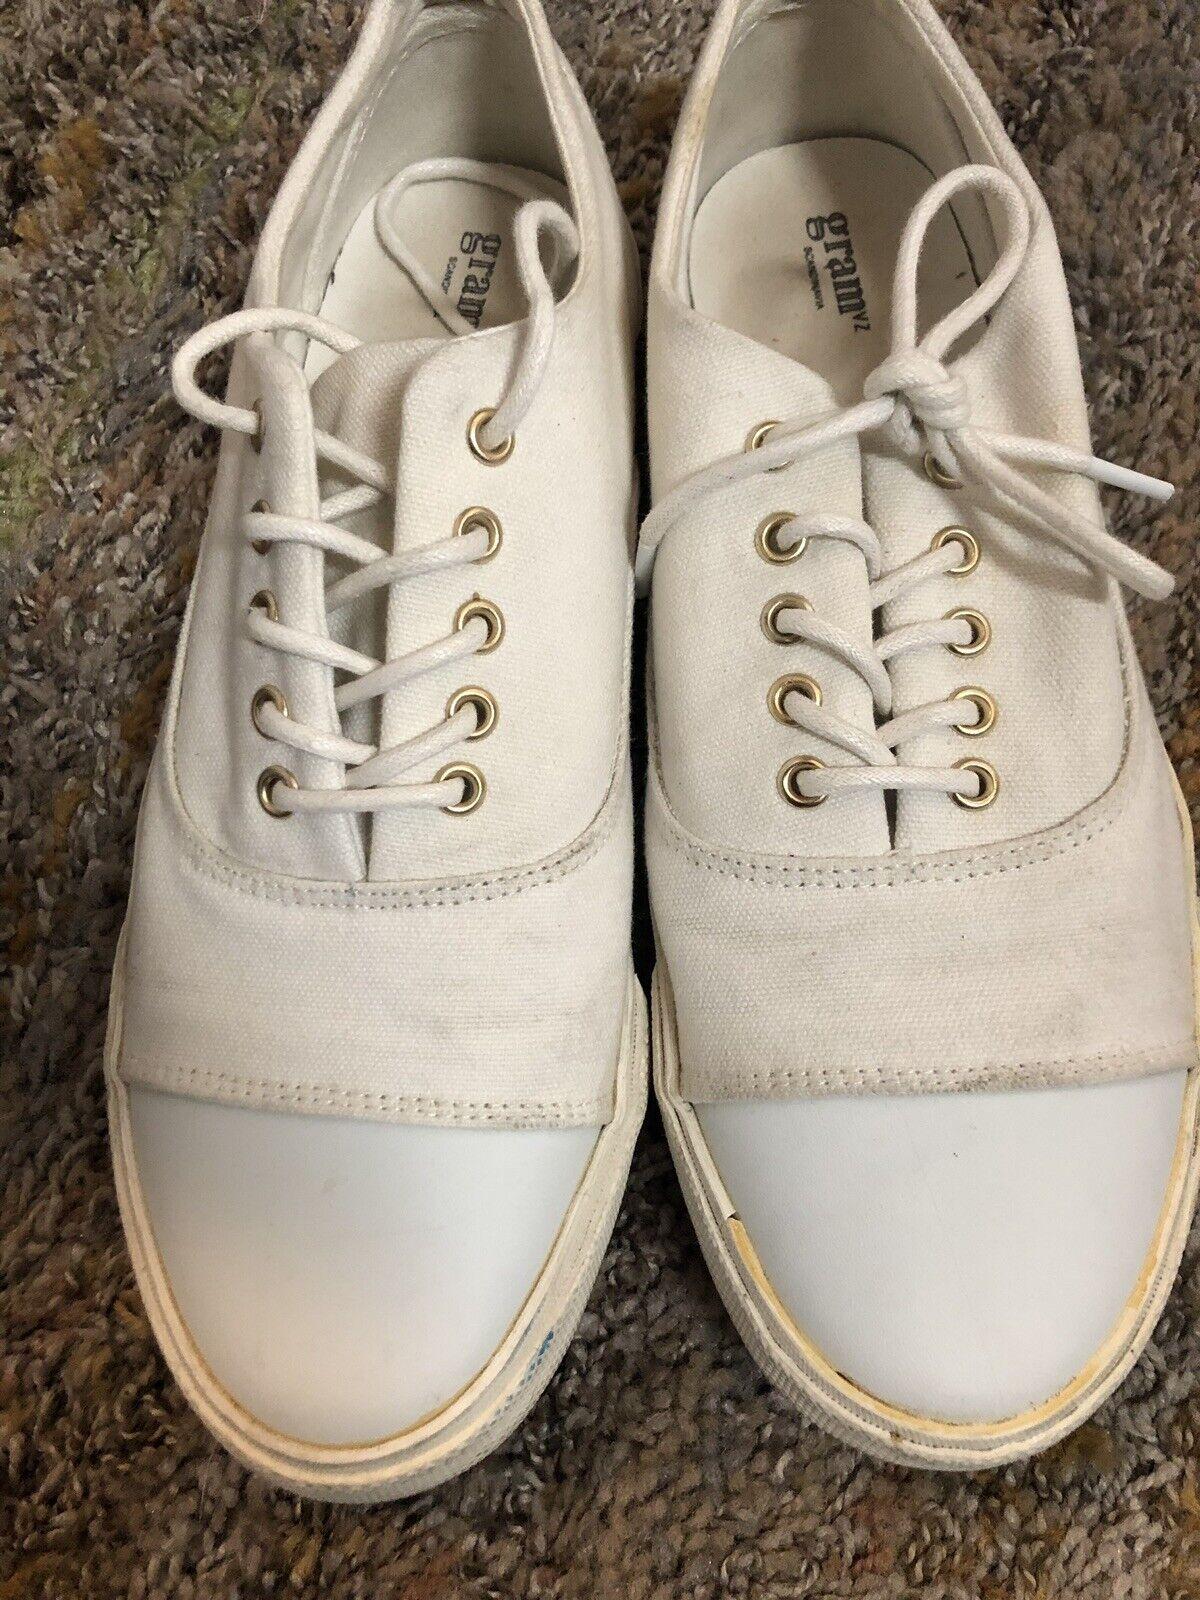 Gram Scandinavia Mens 352g White Canvas Sneakers US Sizs 8.5